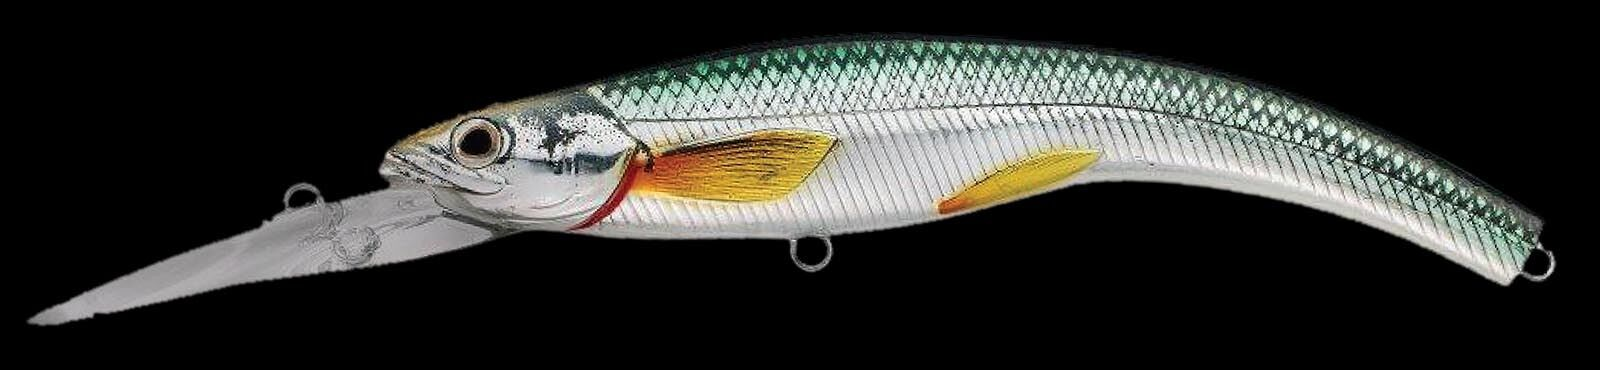 Live Target Rainbow Smelt Banana Bait Shallow Dive 91 Gold Black RSB91S-208